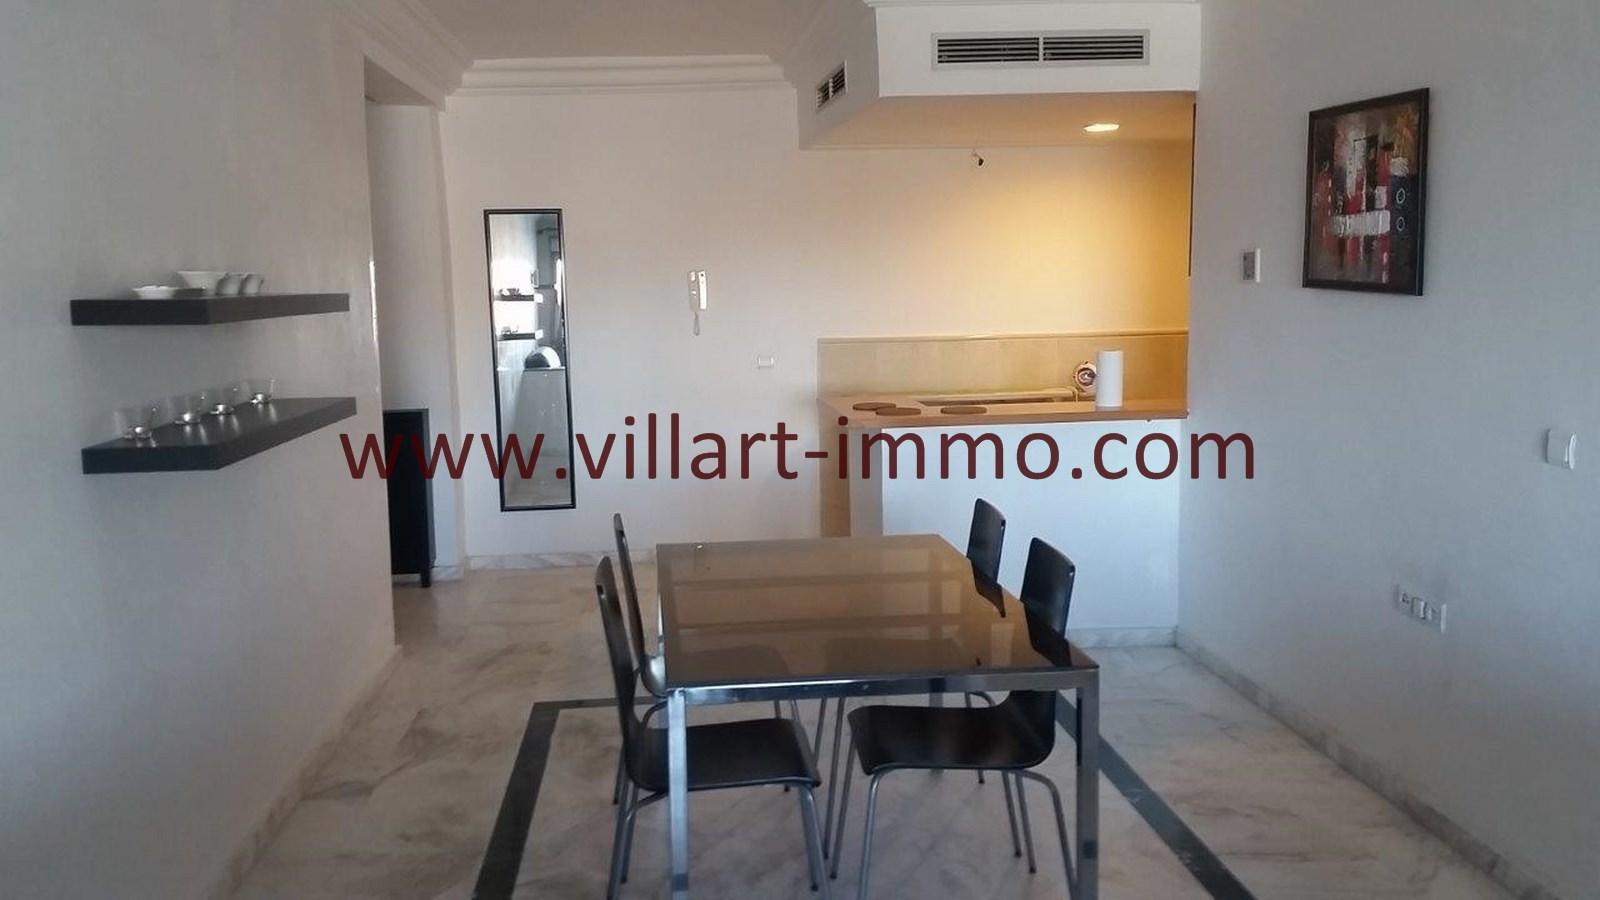 4-Vente-Appartement-Tanger-Centre-De-Ville-Salon 4-VA576-Villart Immo